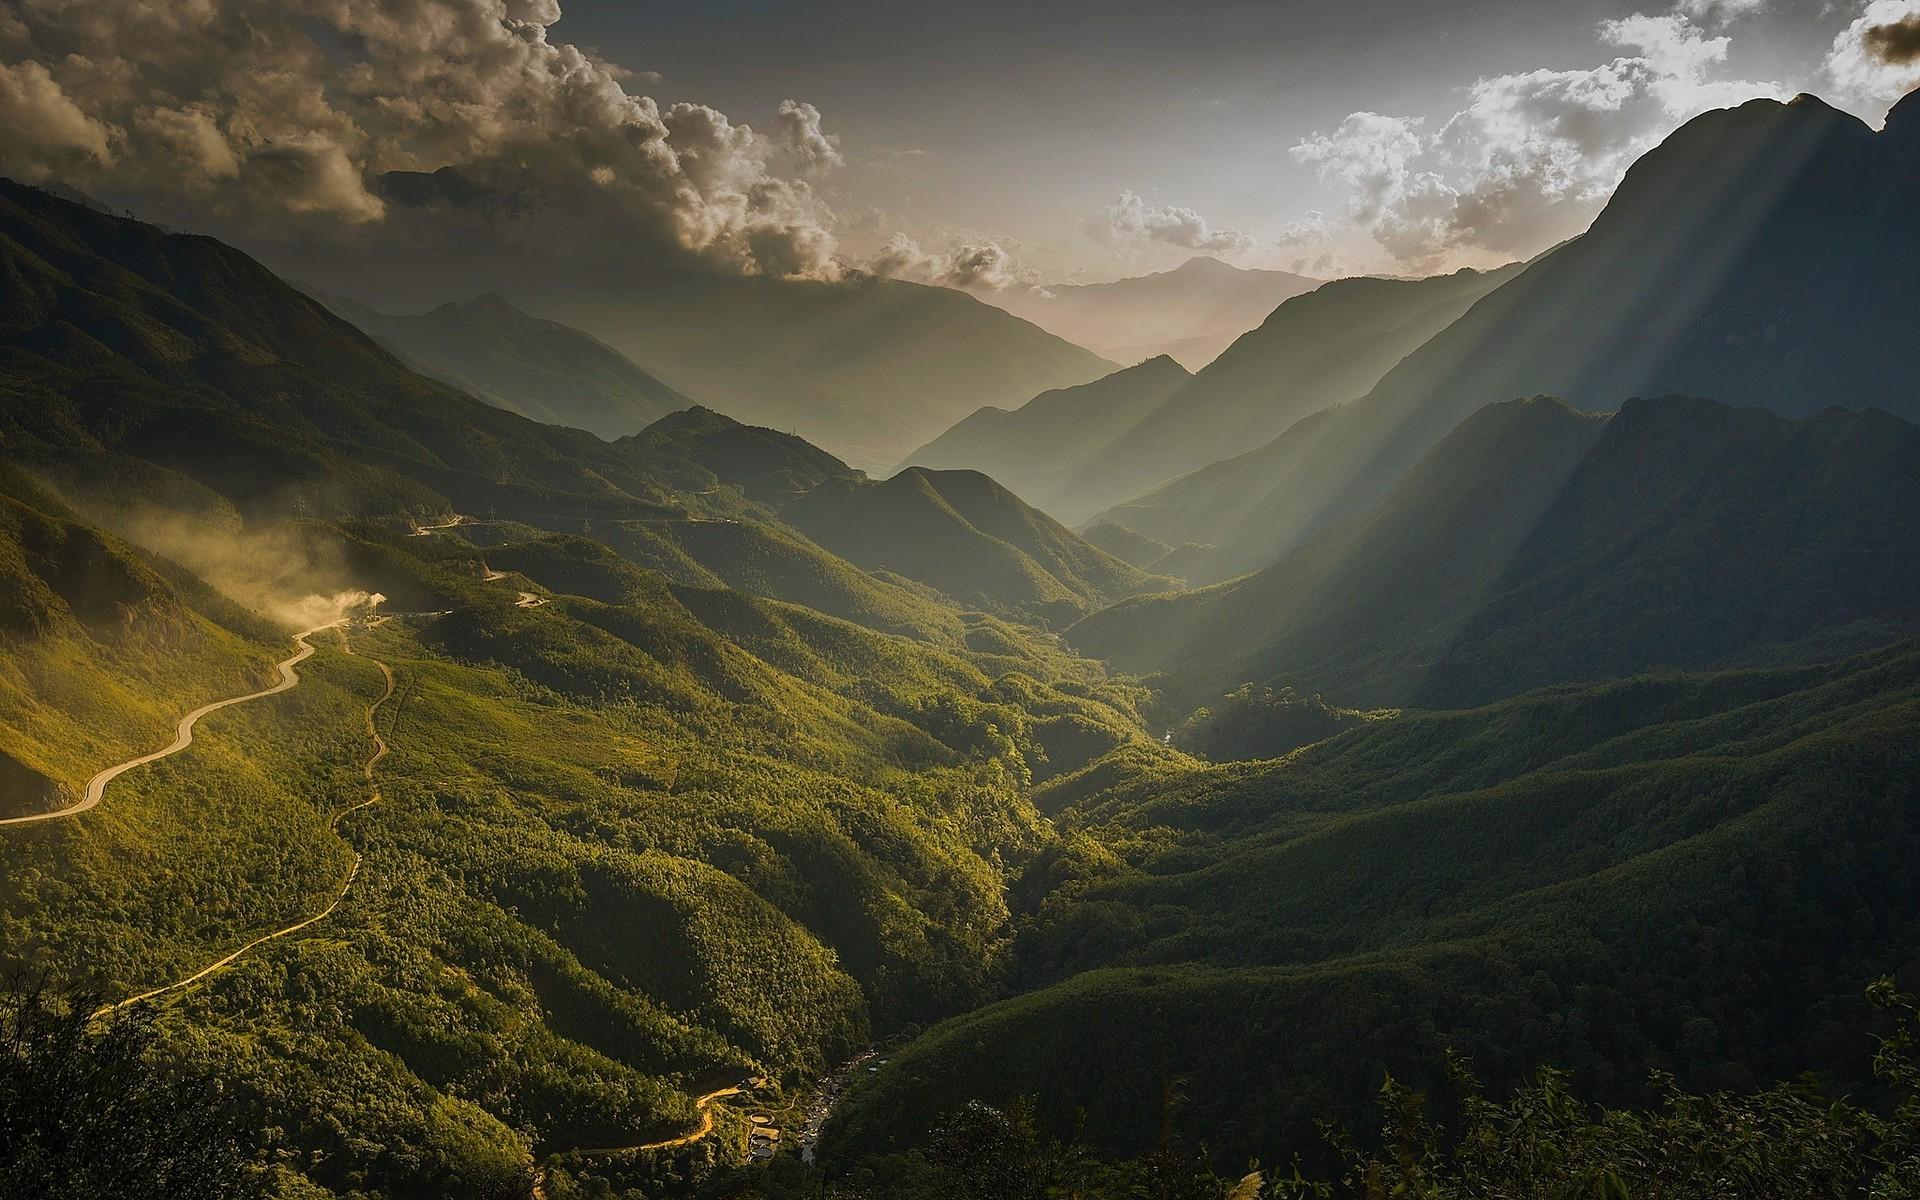 3d Celtic Cross Wallpaper Nature Landscape Sun Rays Mountain Valley River Mist